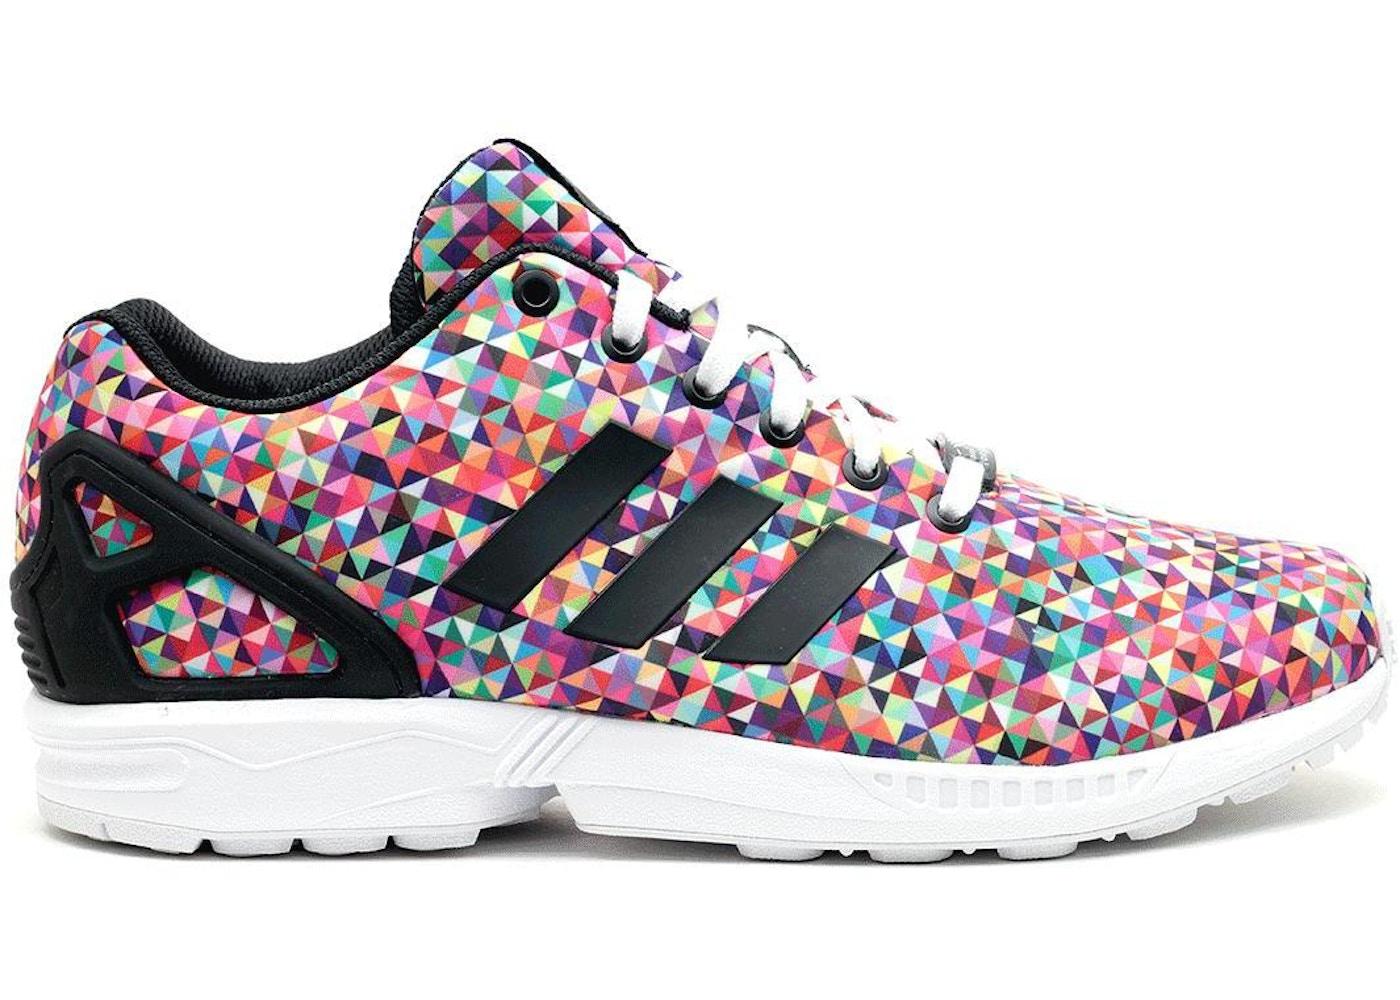 buy popular fea4b 91cc9 adidas ZX Flux Multi-Color Prism